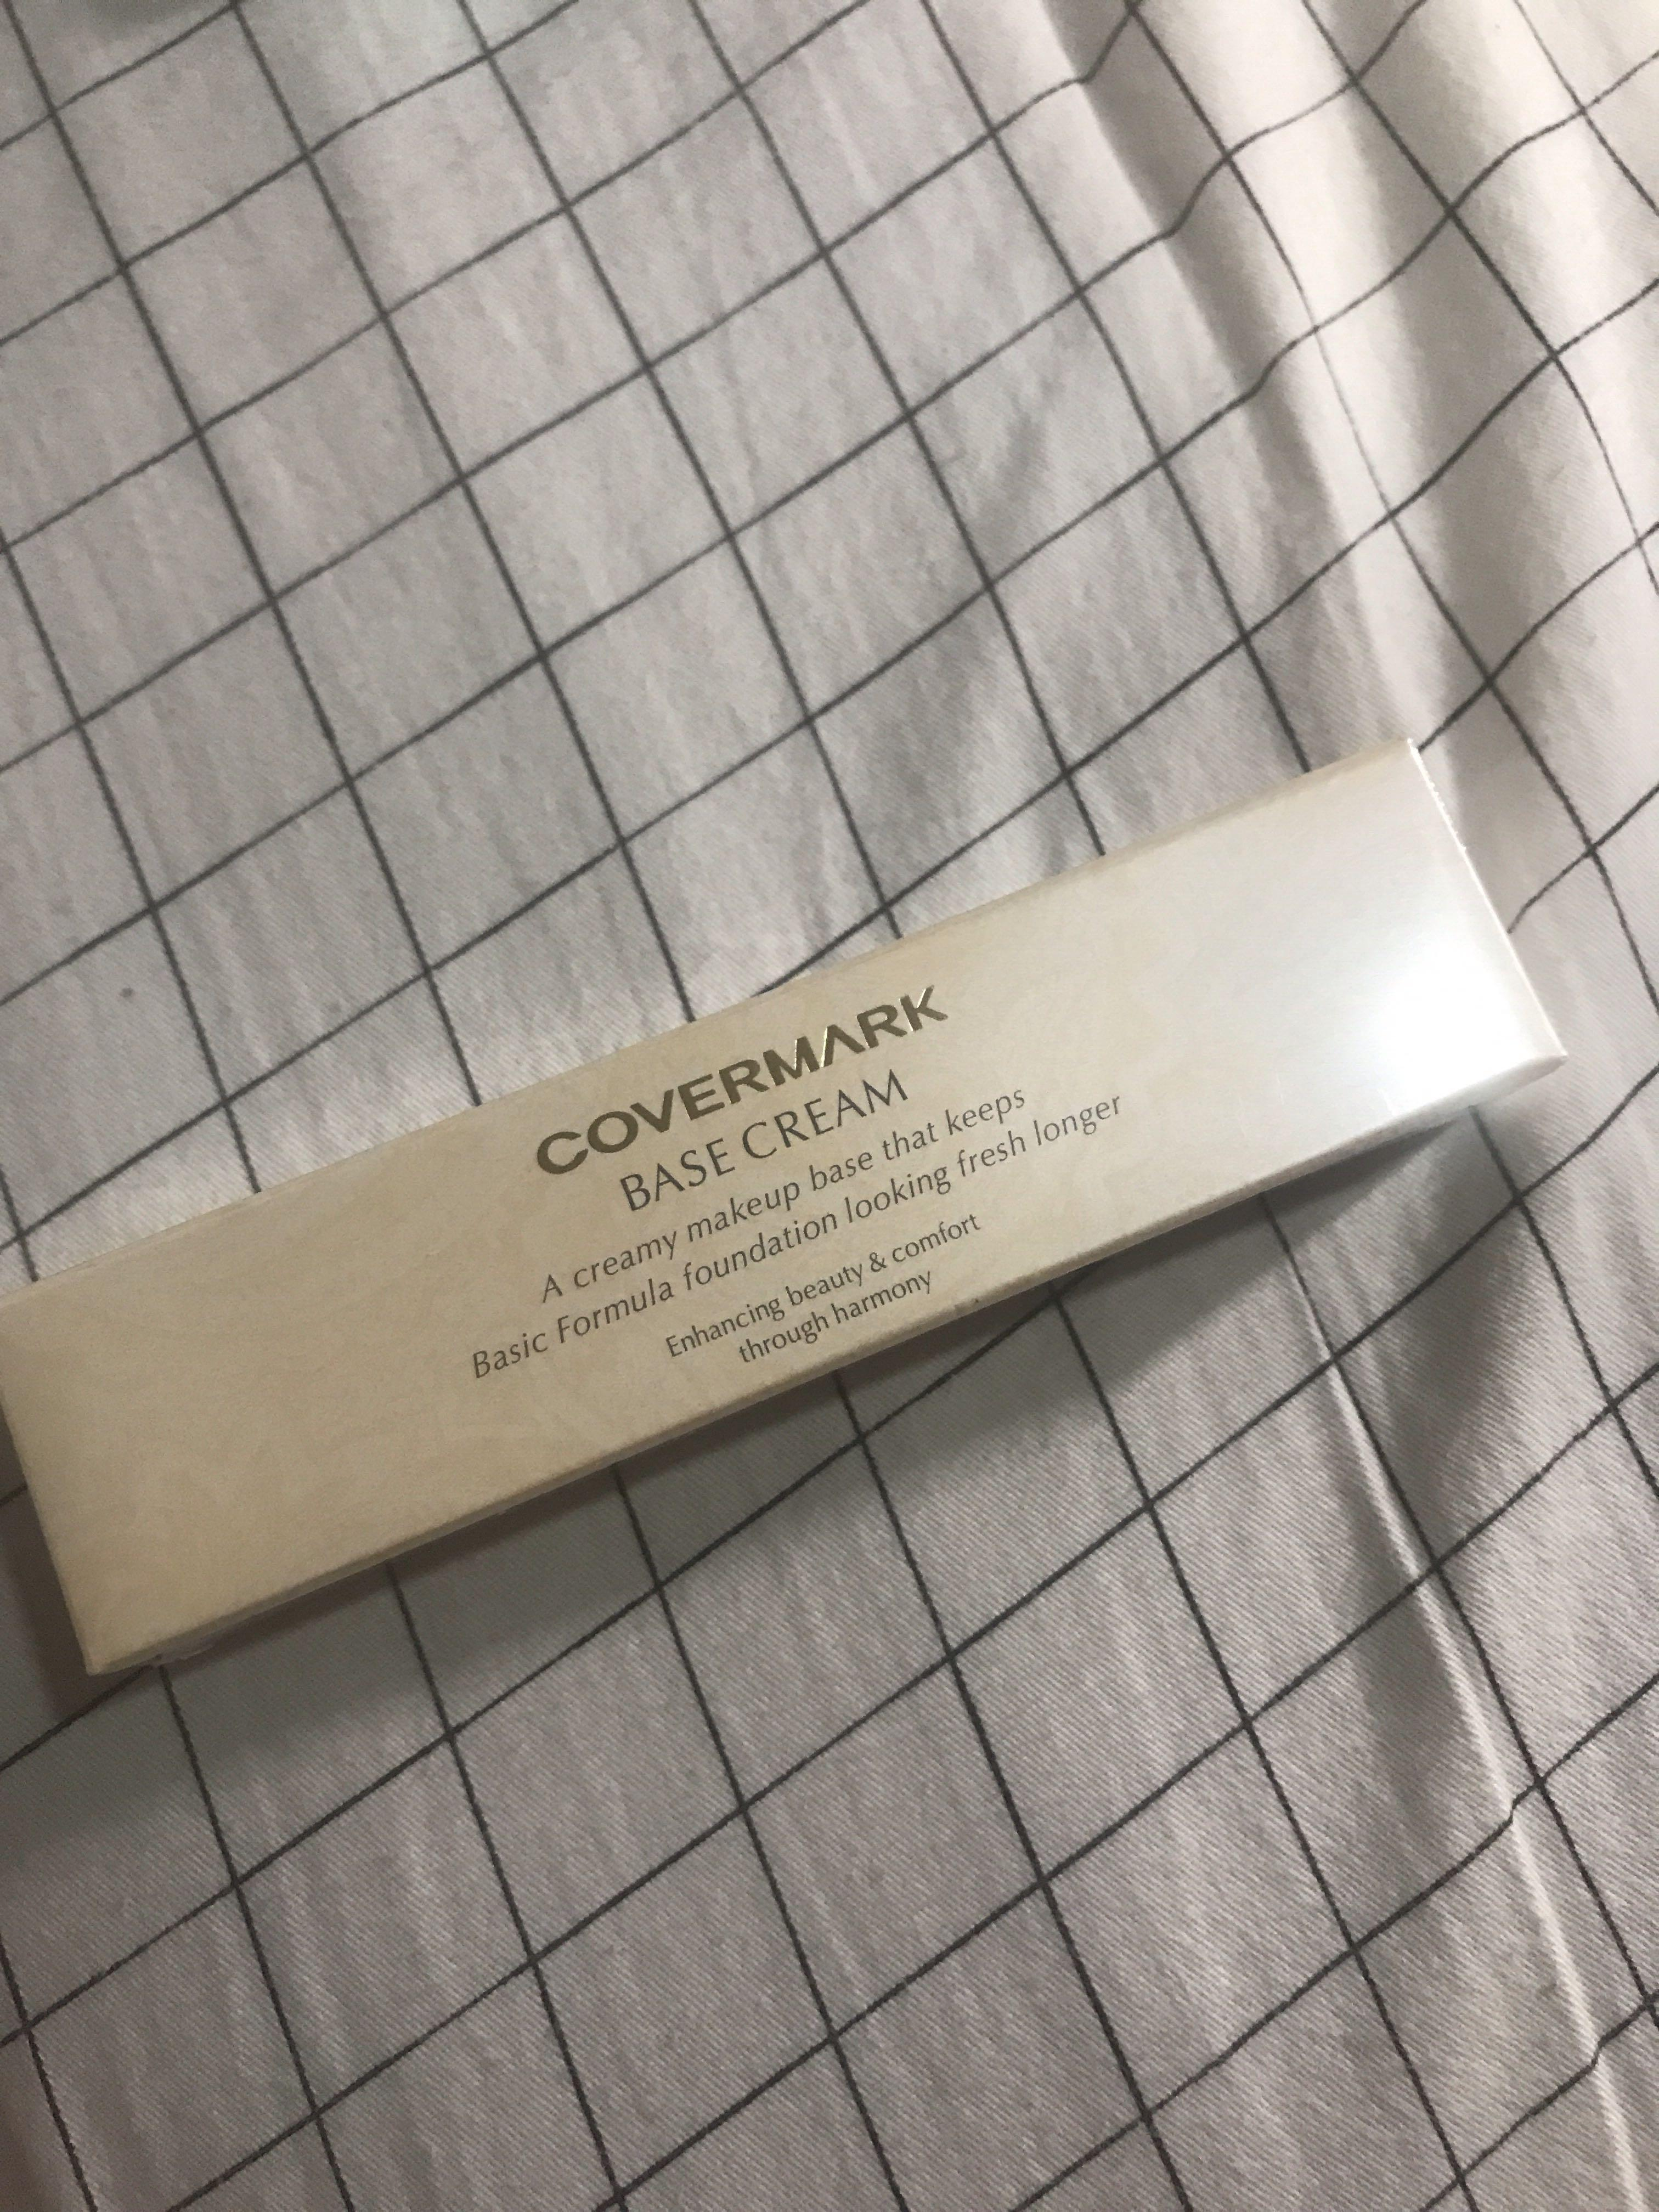 Covermark Base Cream